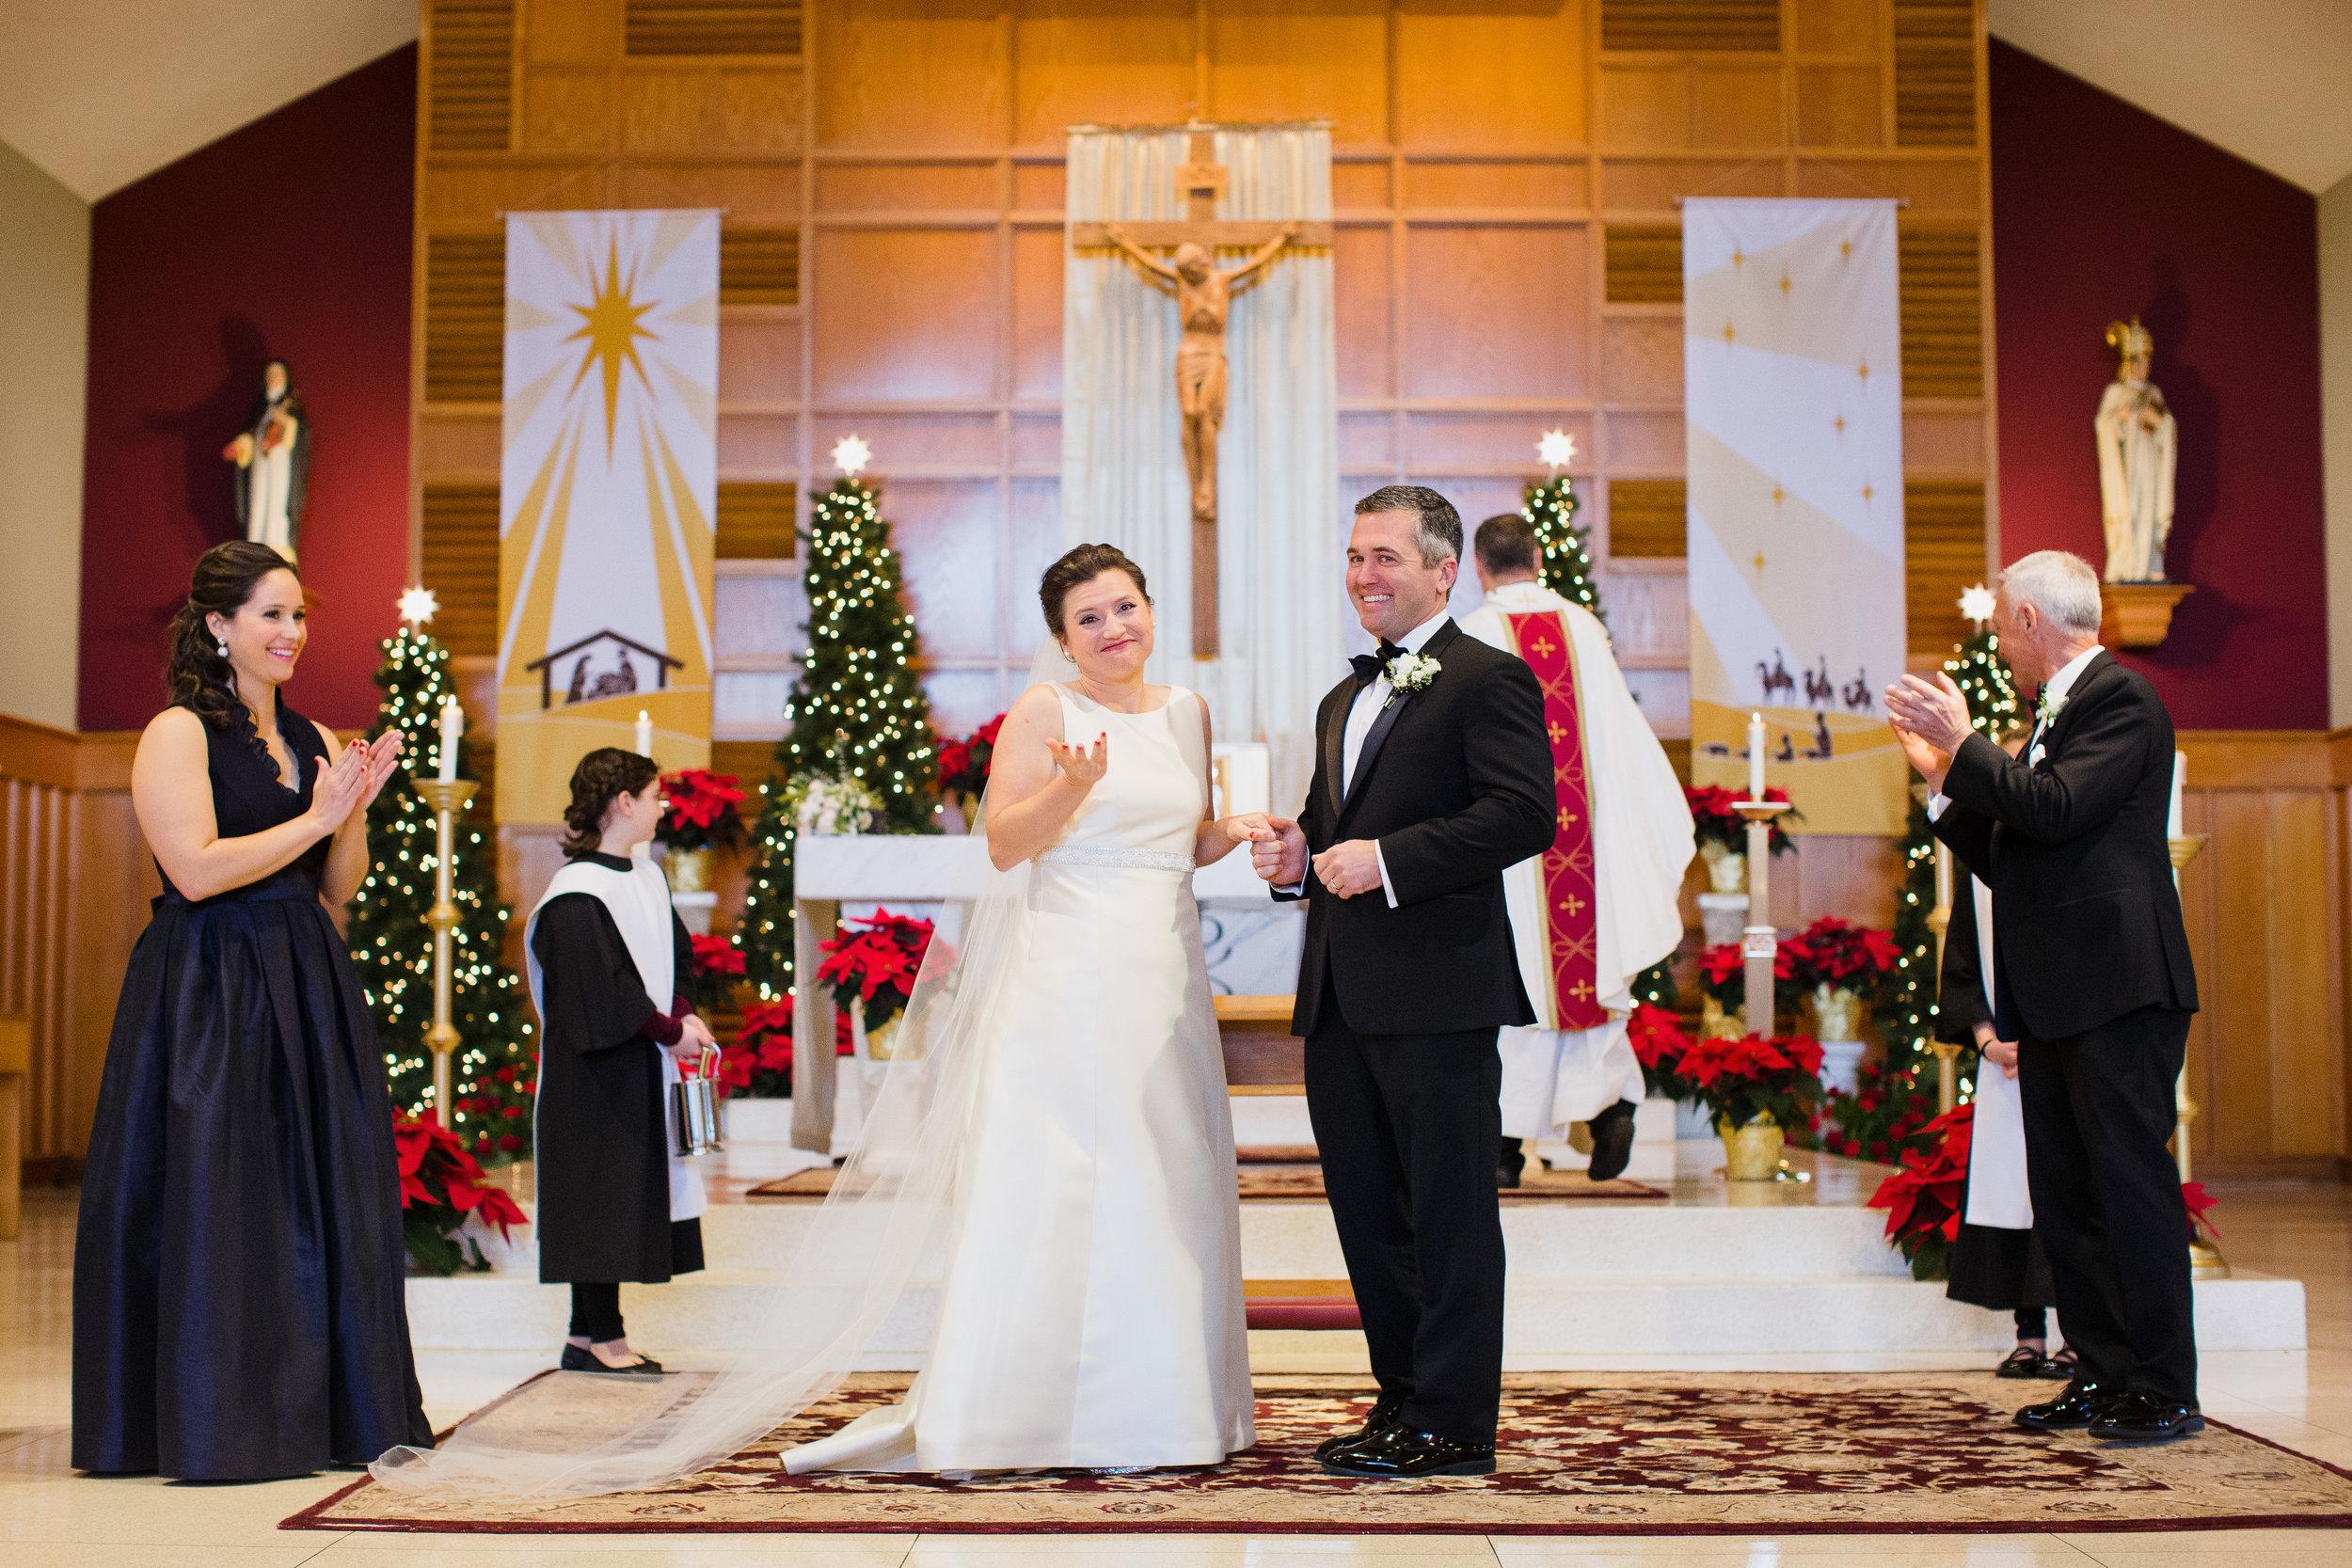 gracies-providence-wedding-096.JPG